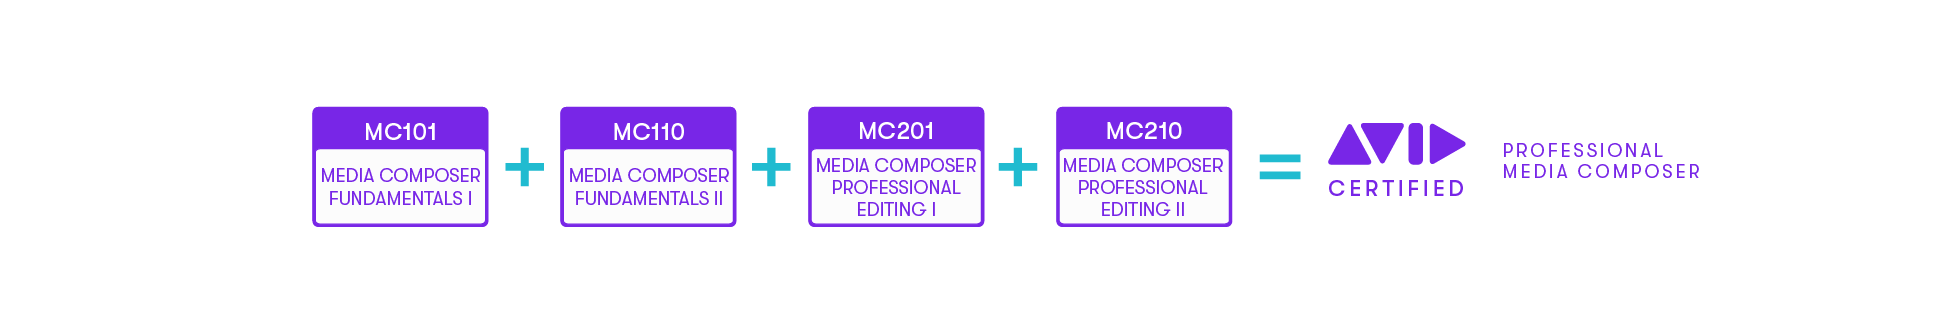 ACPMediaComposer1200x750